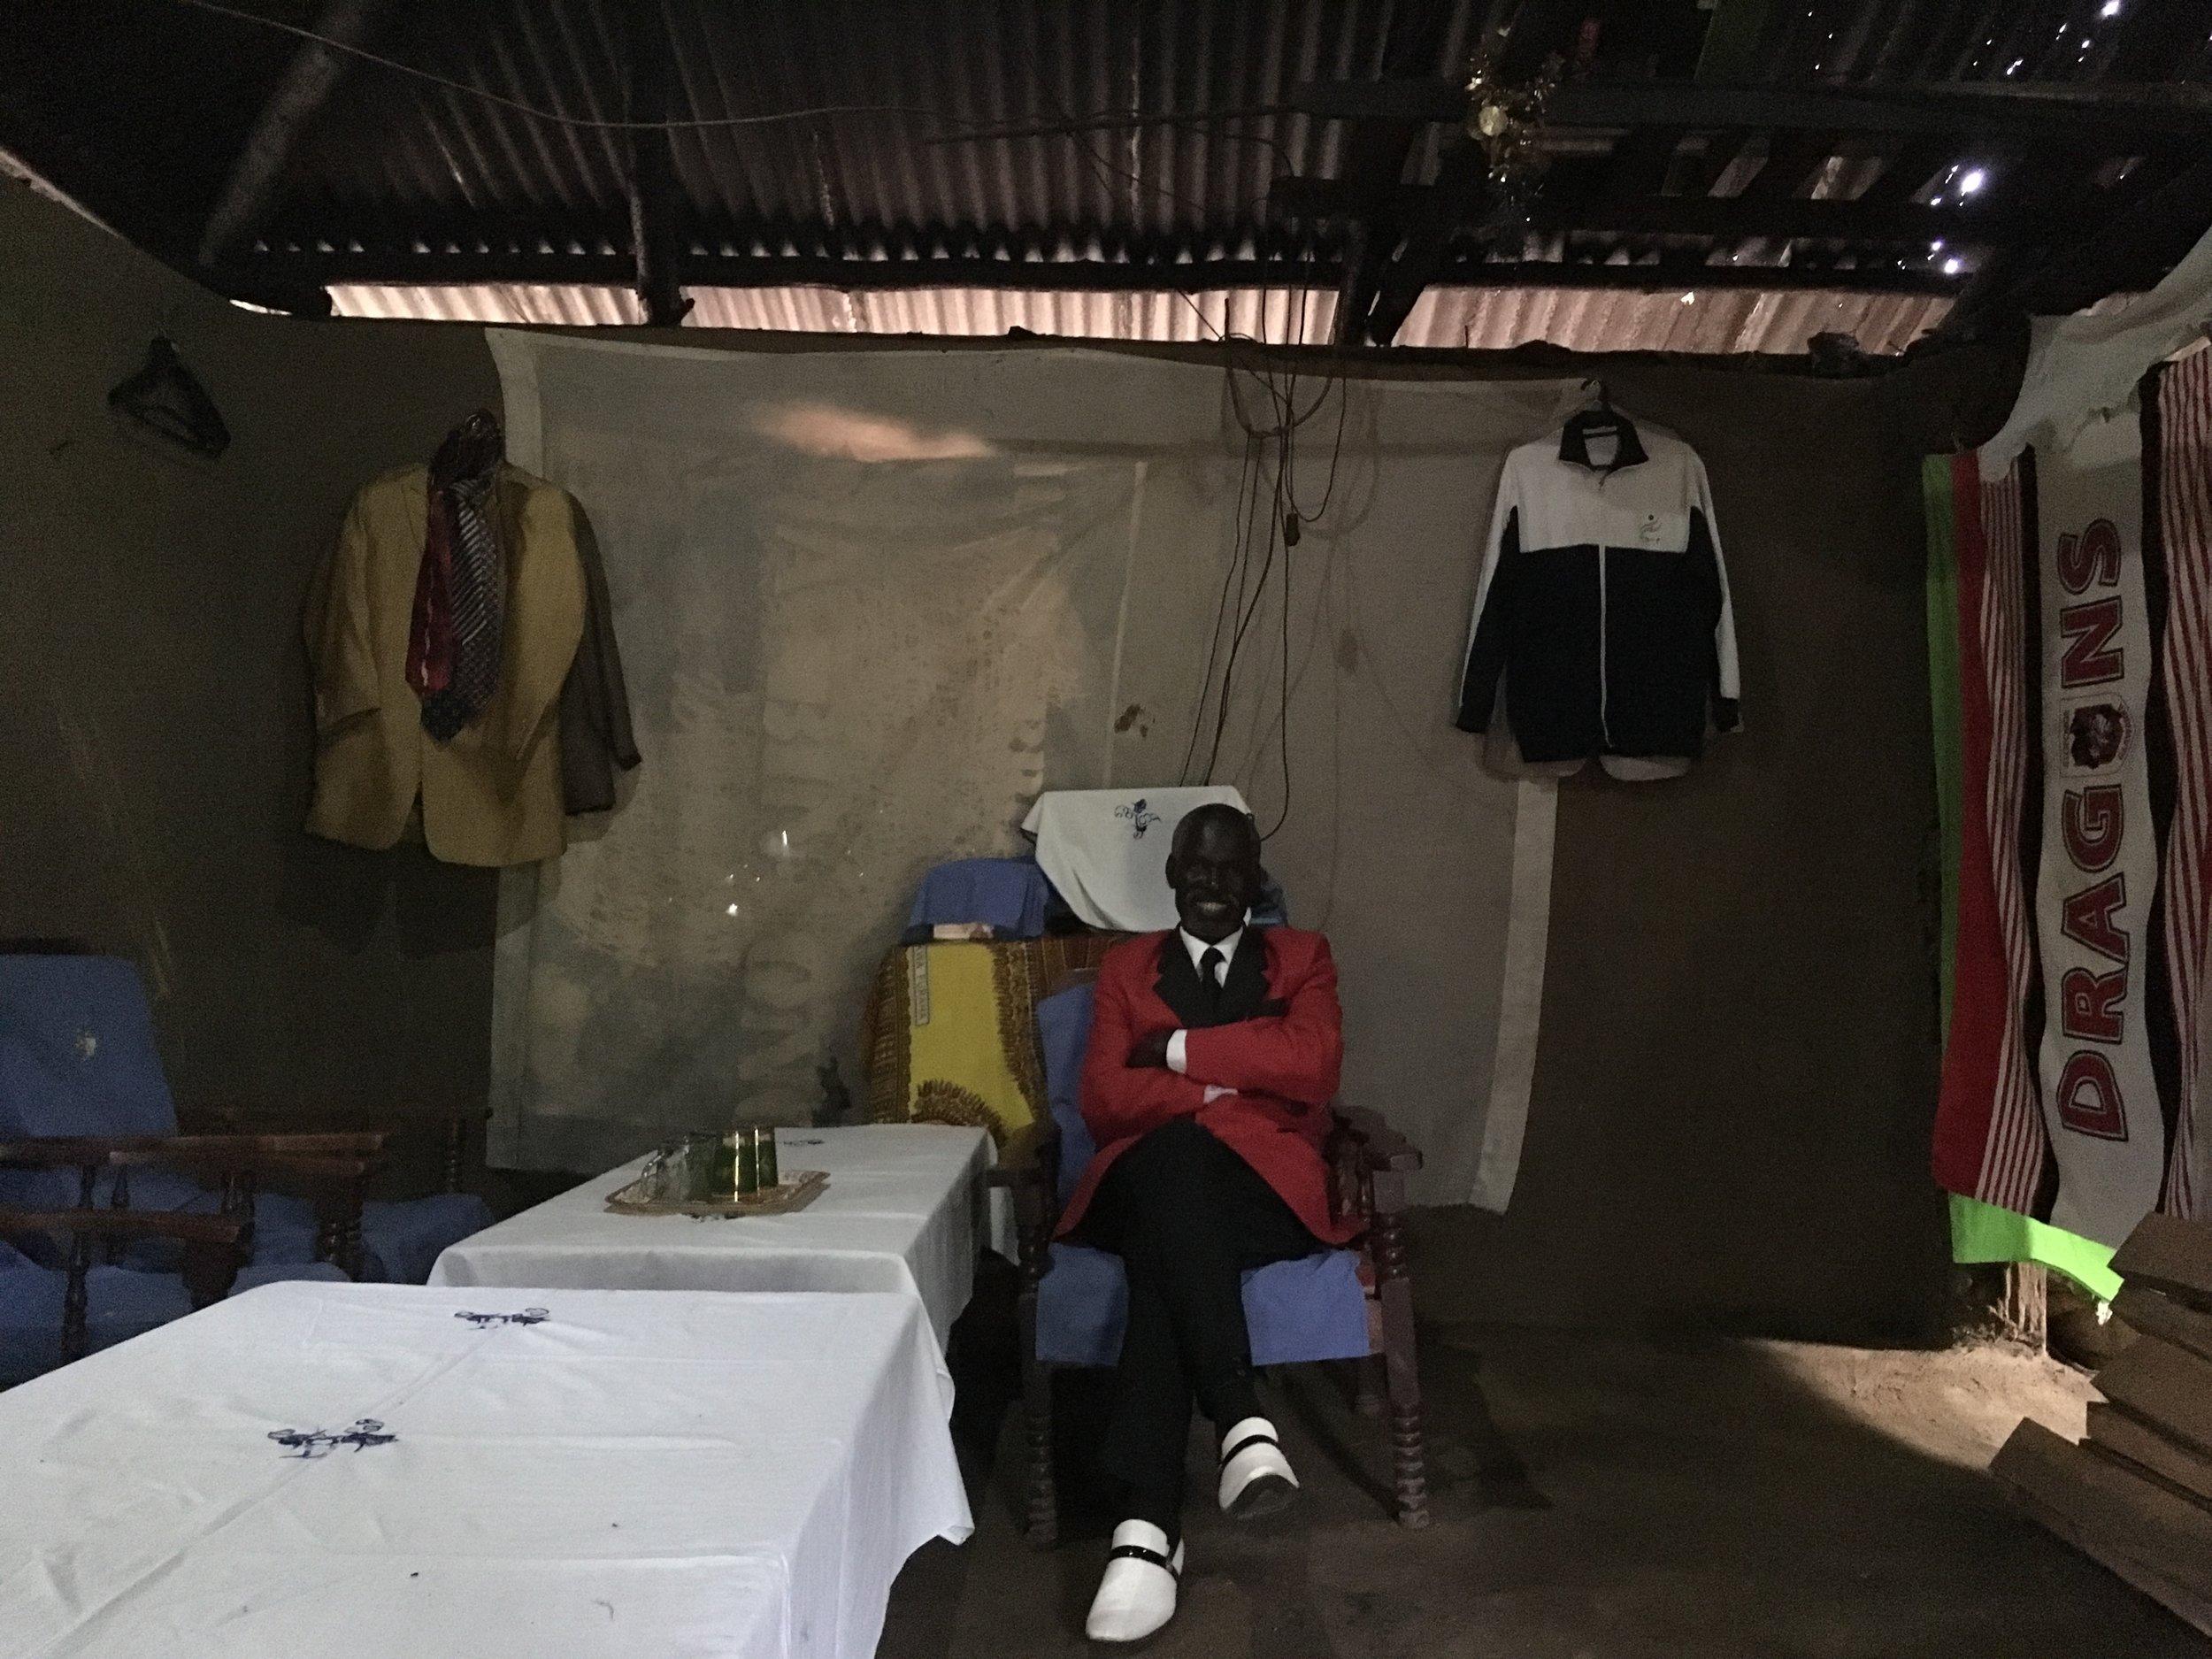 Sukuma with a small part of his wardrobe